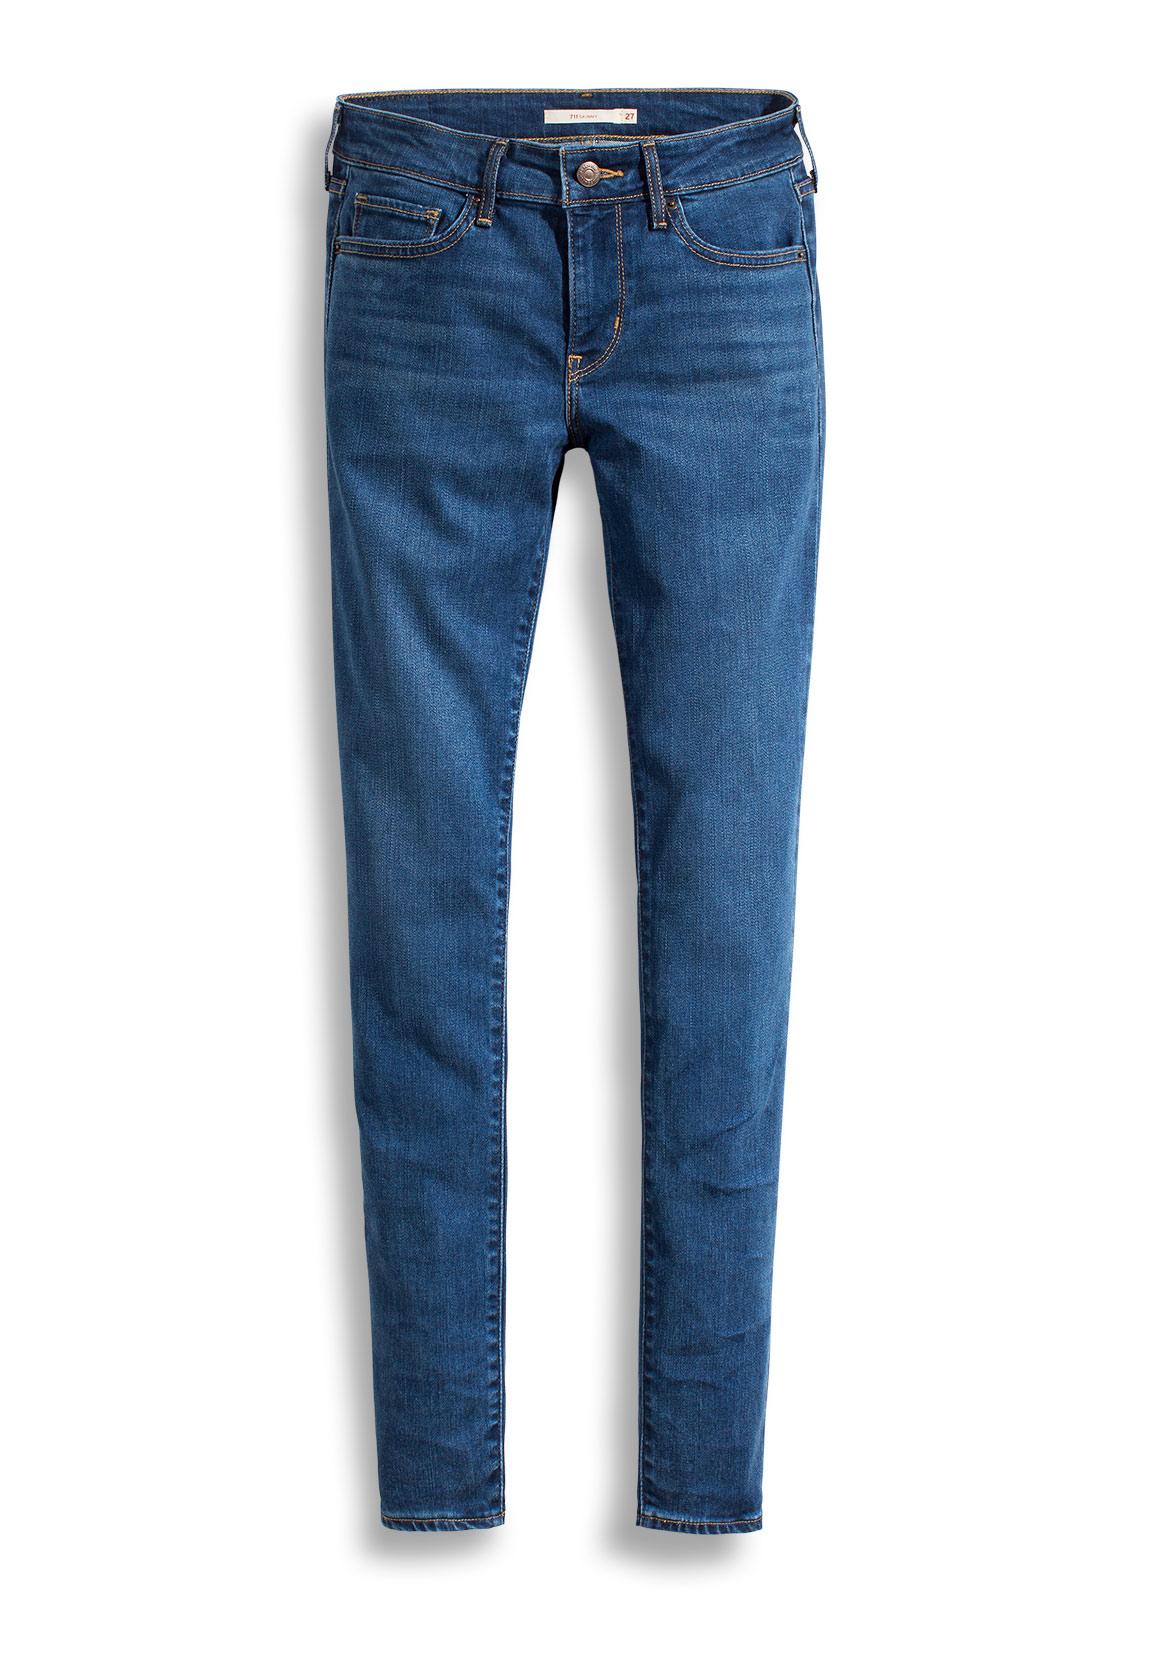 levis damen jeans 712 slim 18884 0113 escape artist damen. Black Bedroom Furniture Sets. Home Design Ideas